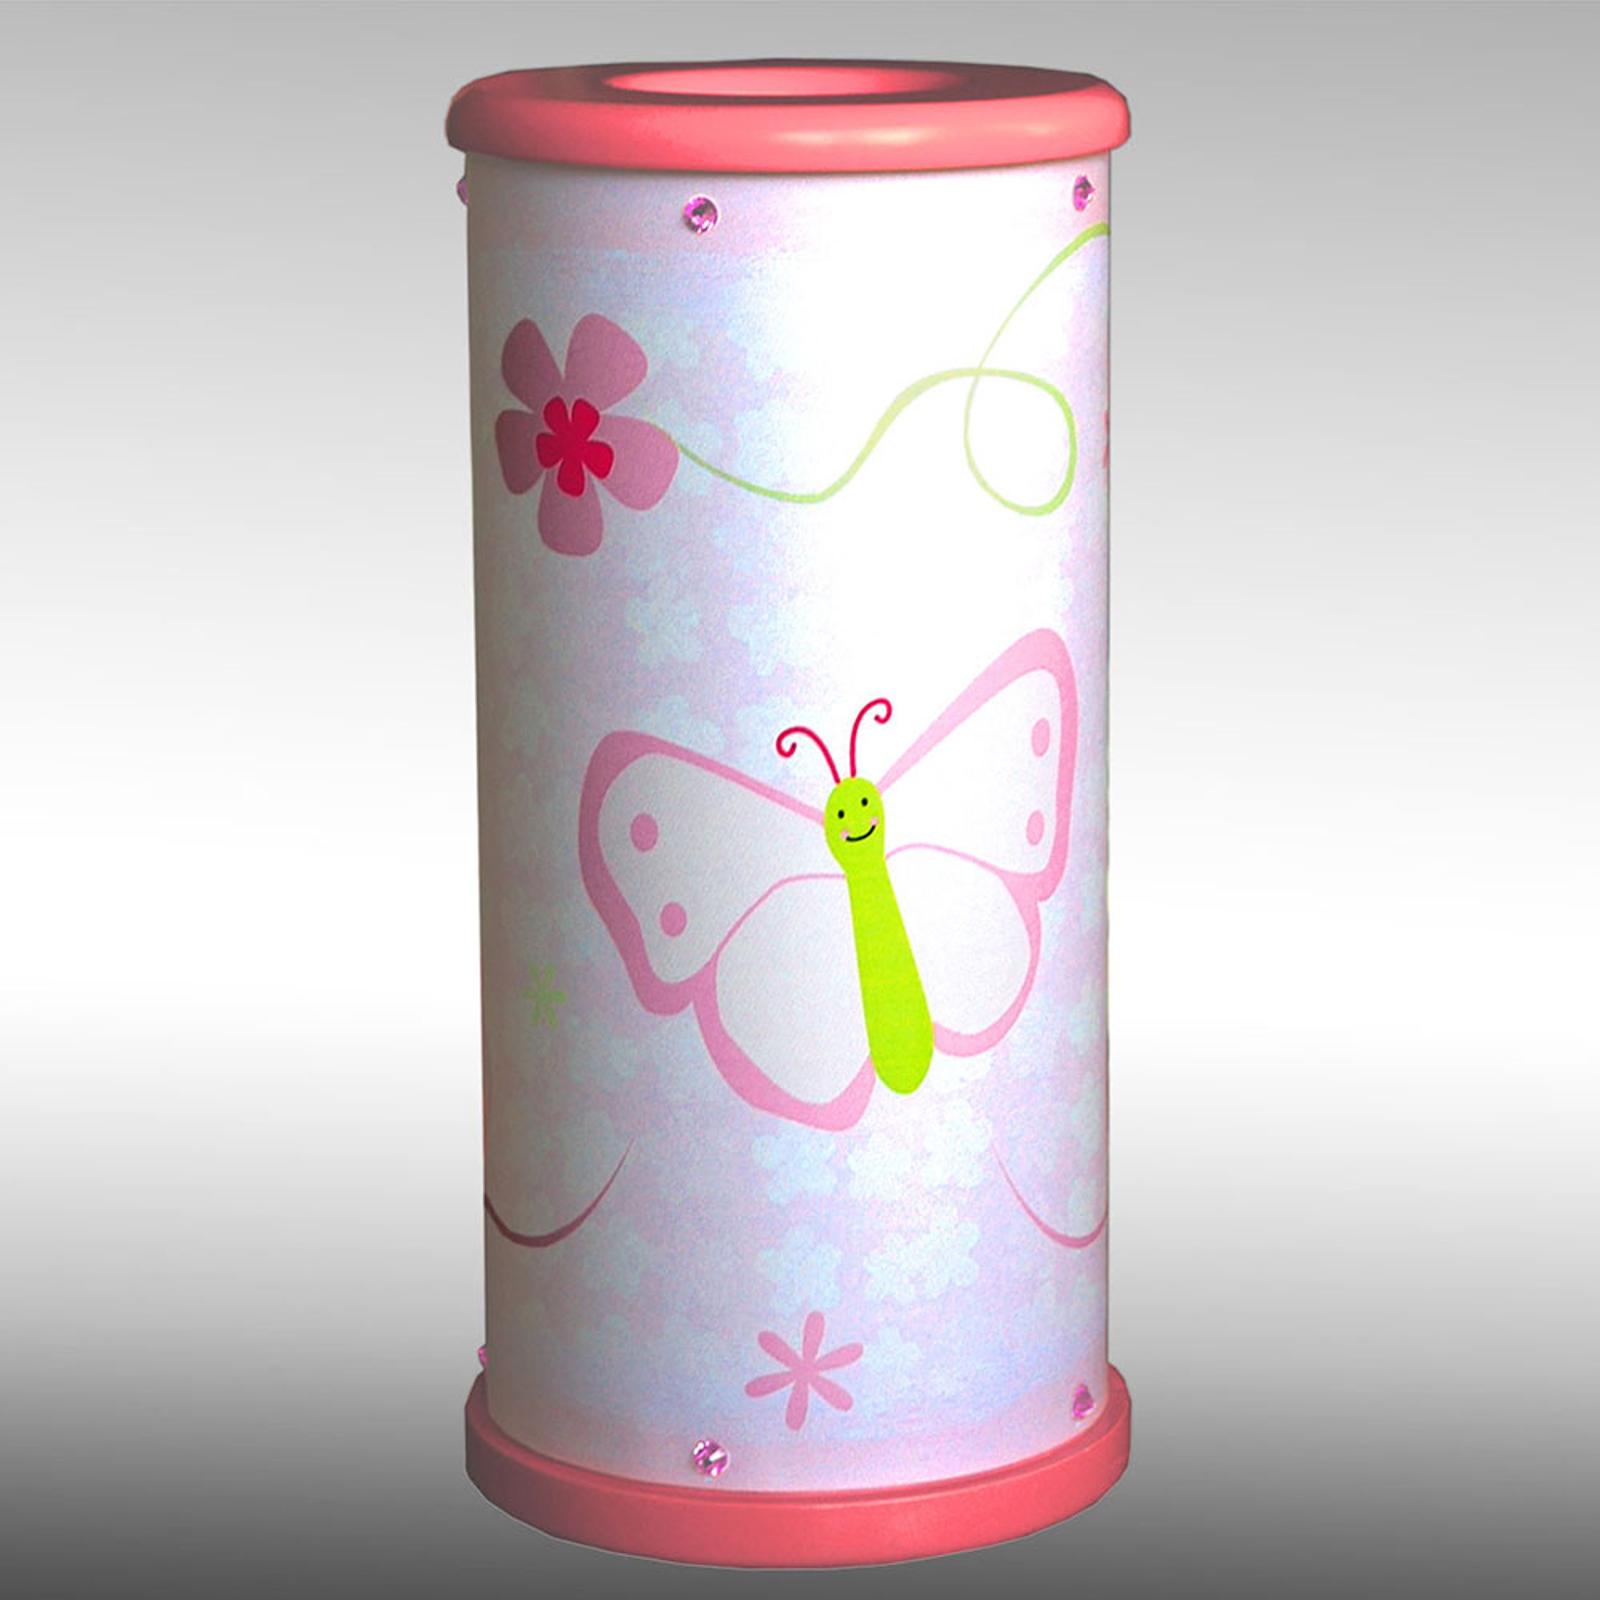 Papillon - LED tafellamp voor de kinderkamer